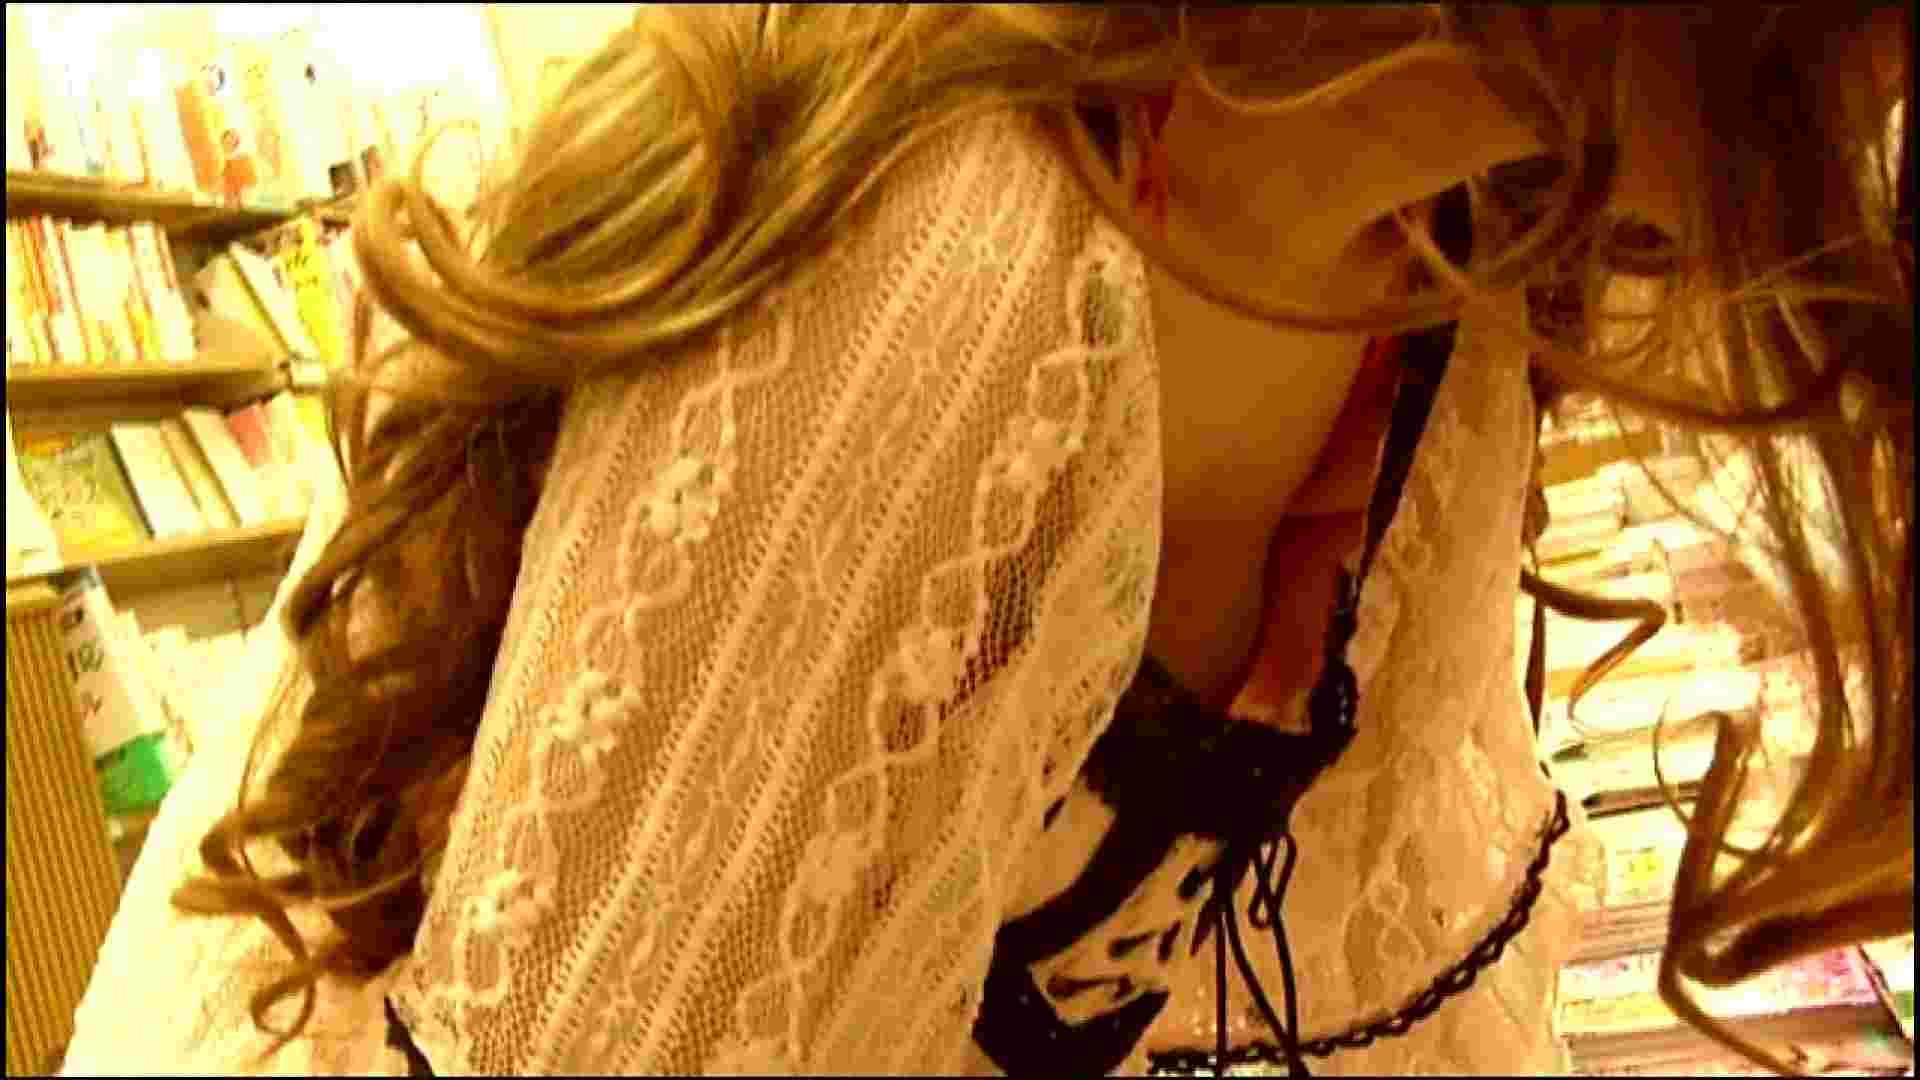 NO.2 本屋にいた巨乳ギャル 胸チラ・のぞき ぱこり動画紹介 95枚 19